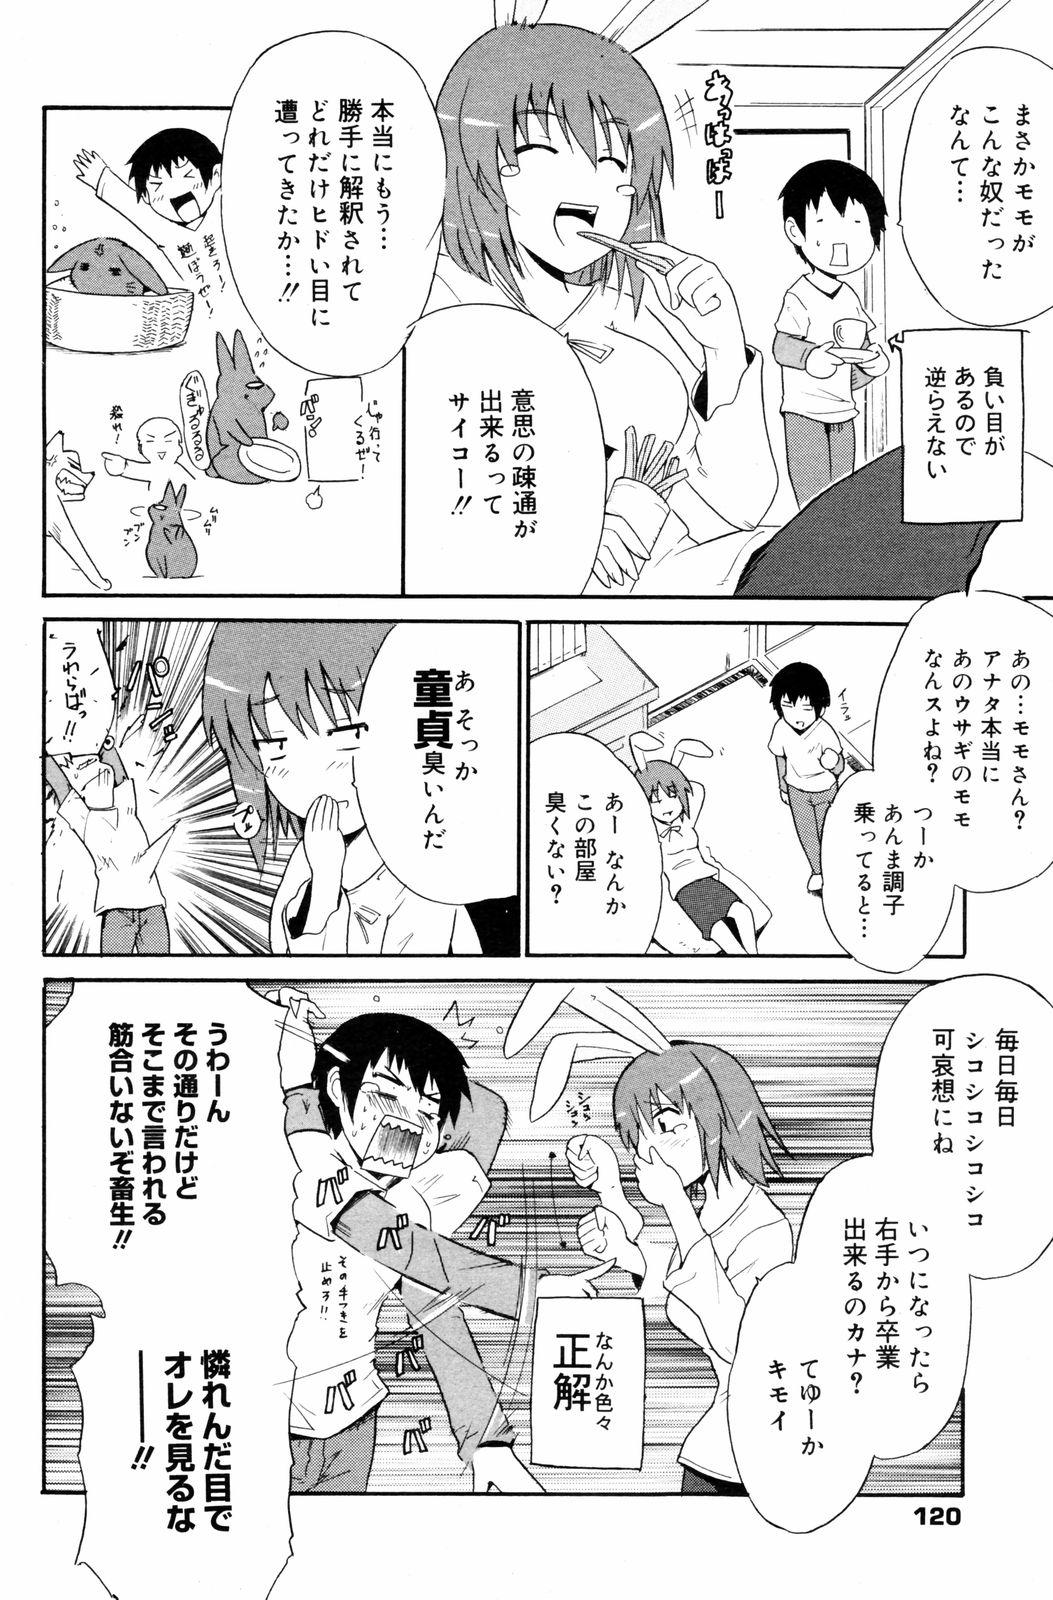 Manga Bangaichi 2008-03 119